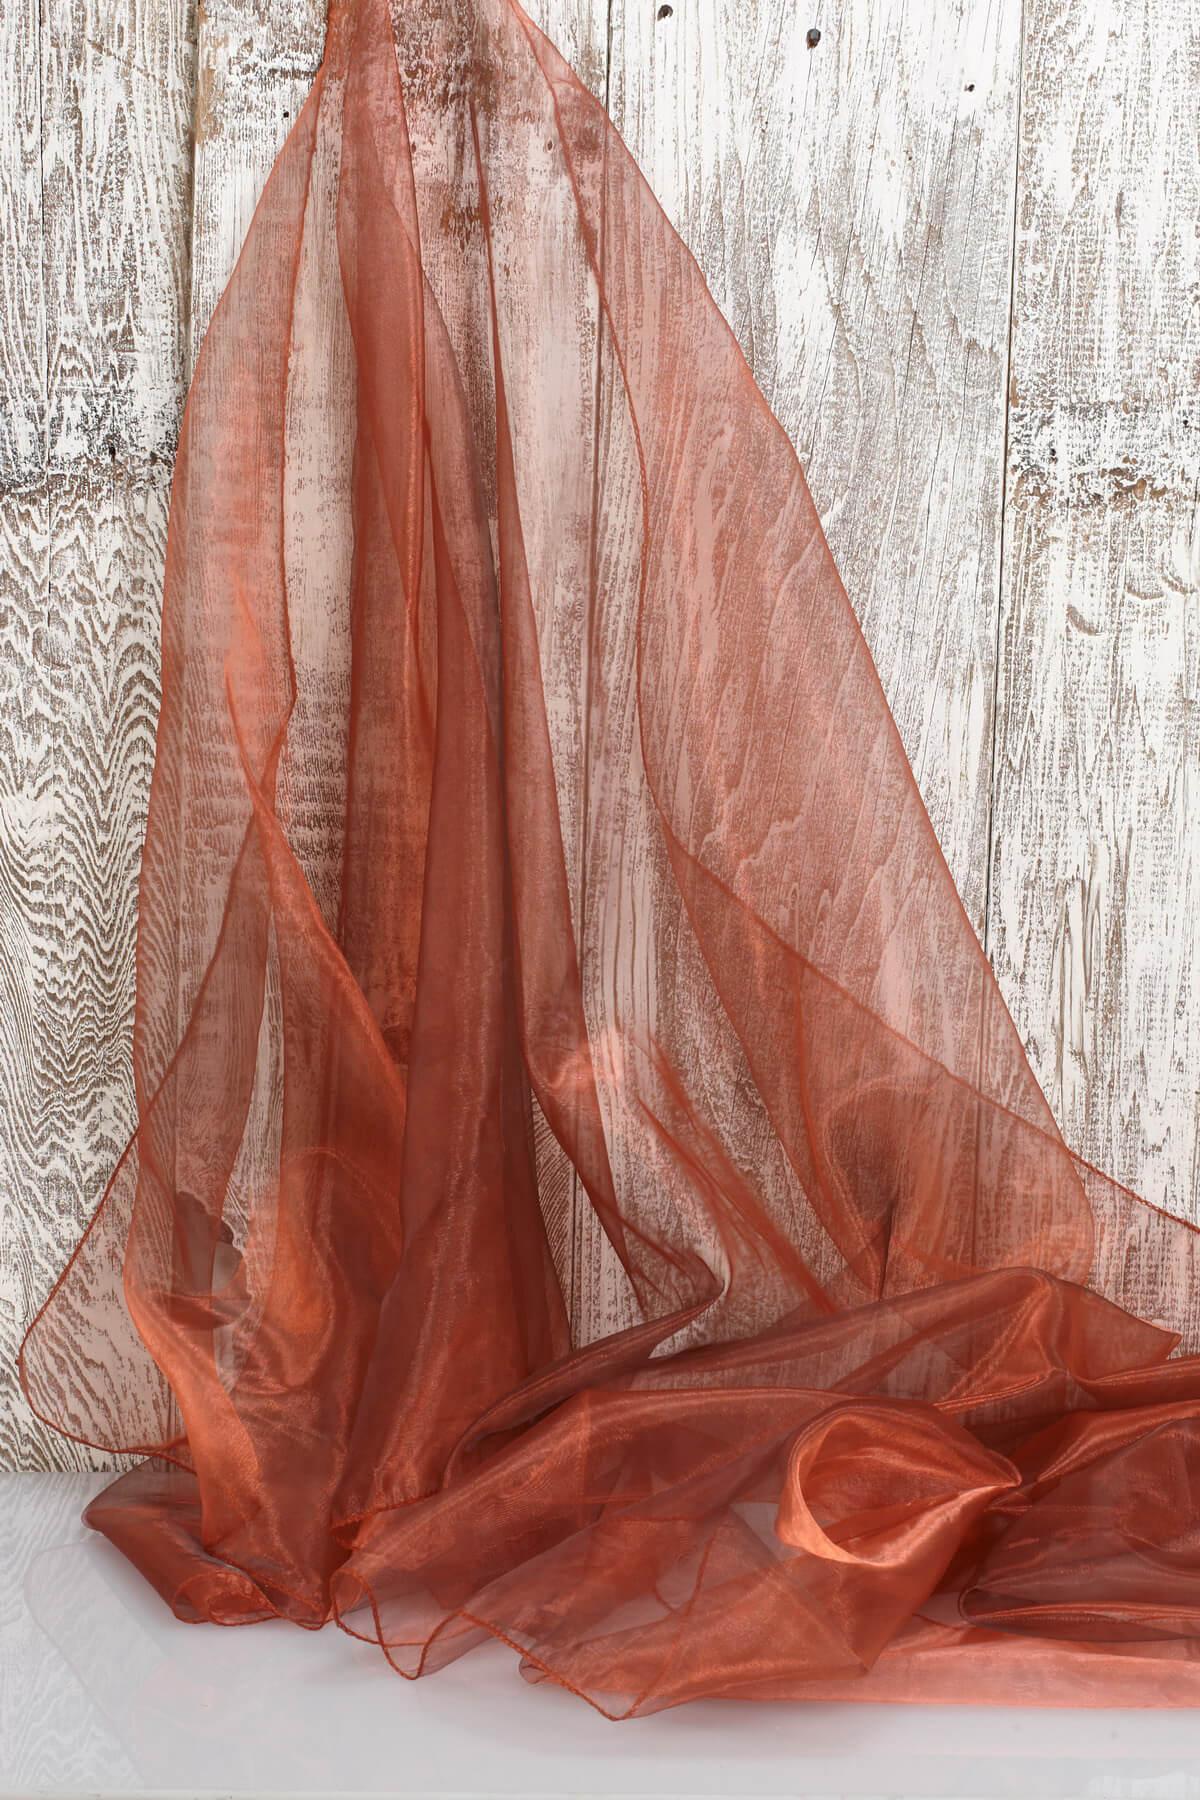 "Two Tone Hemmed Organza Fabric Copper & Black (28"" width x 3 yds)"